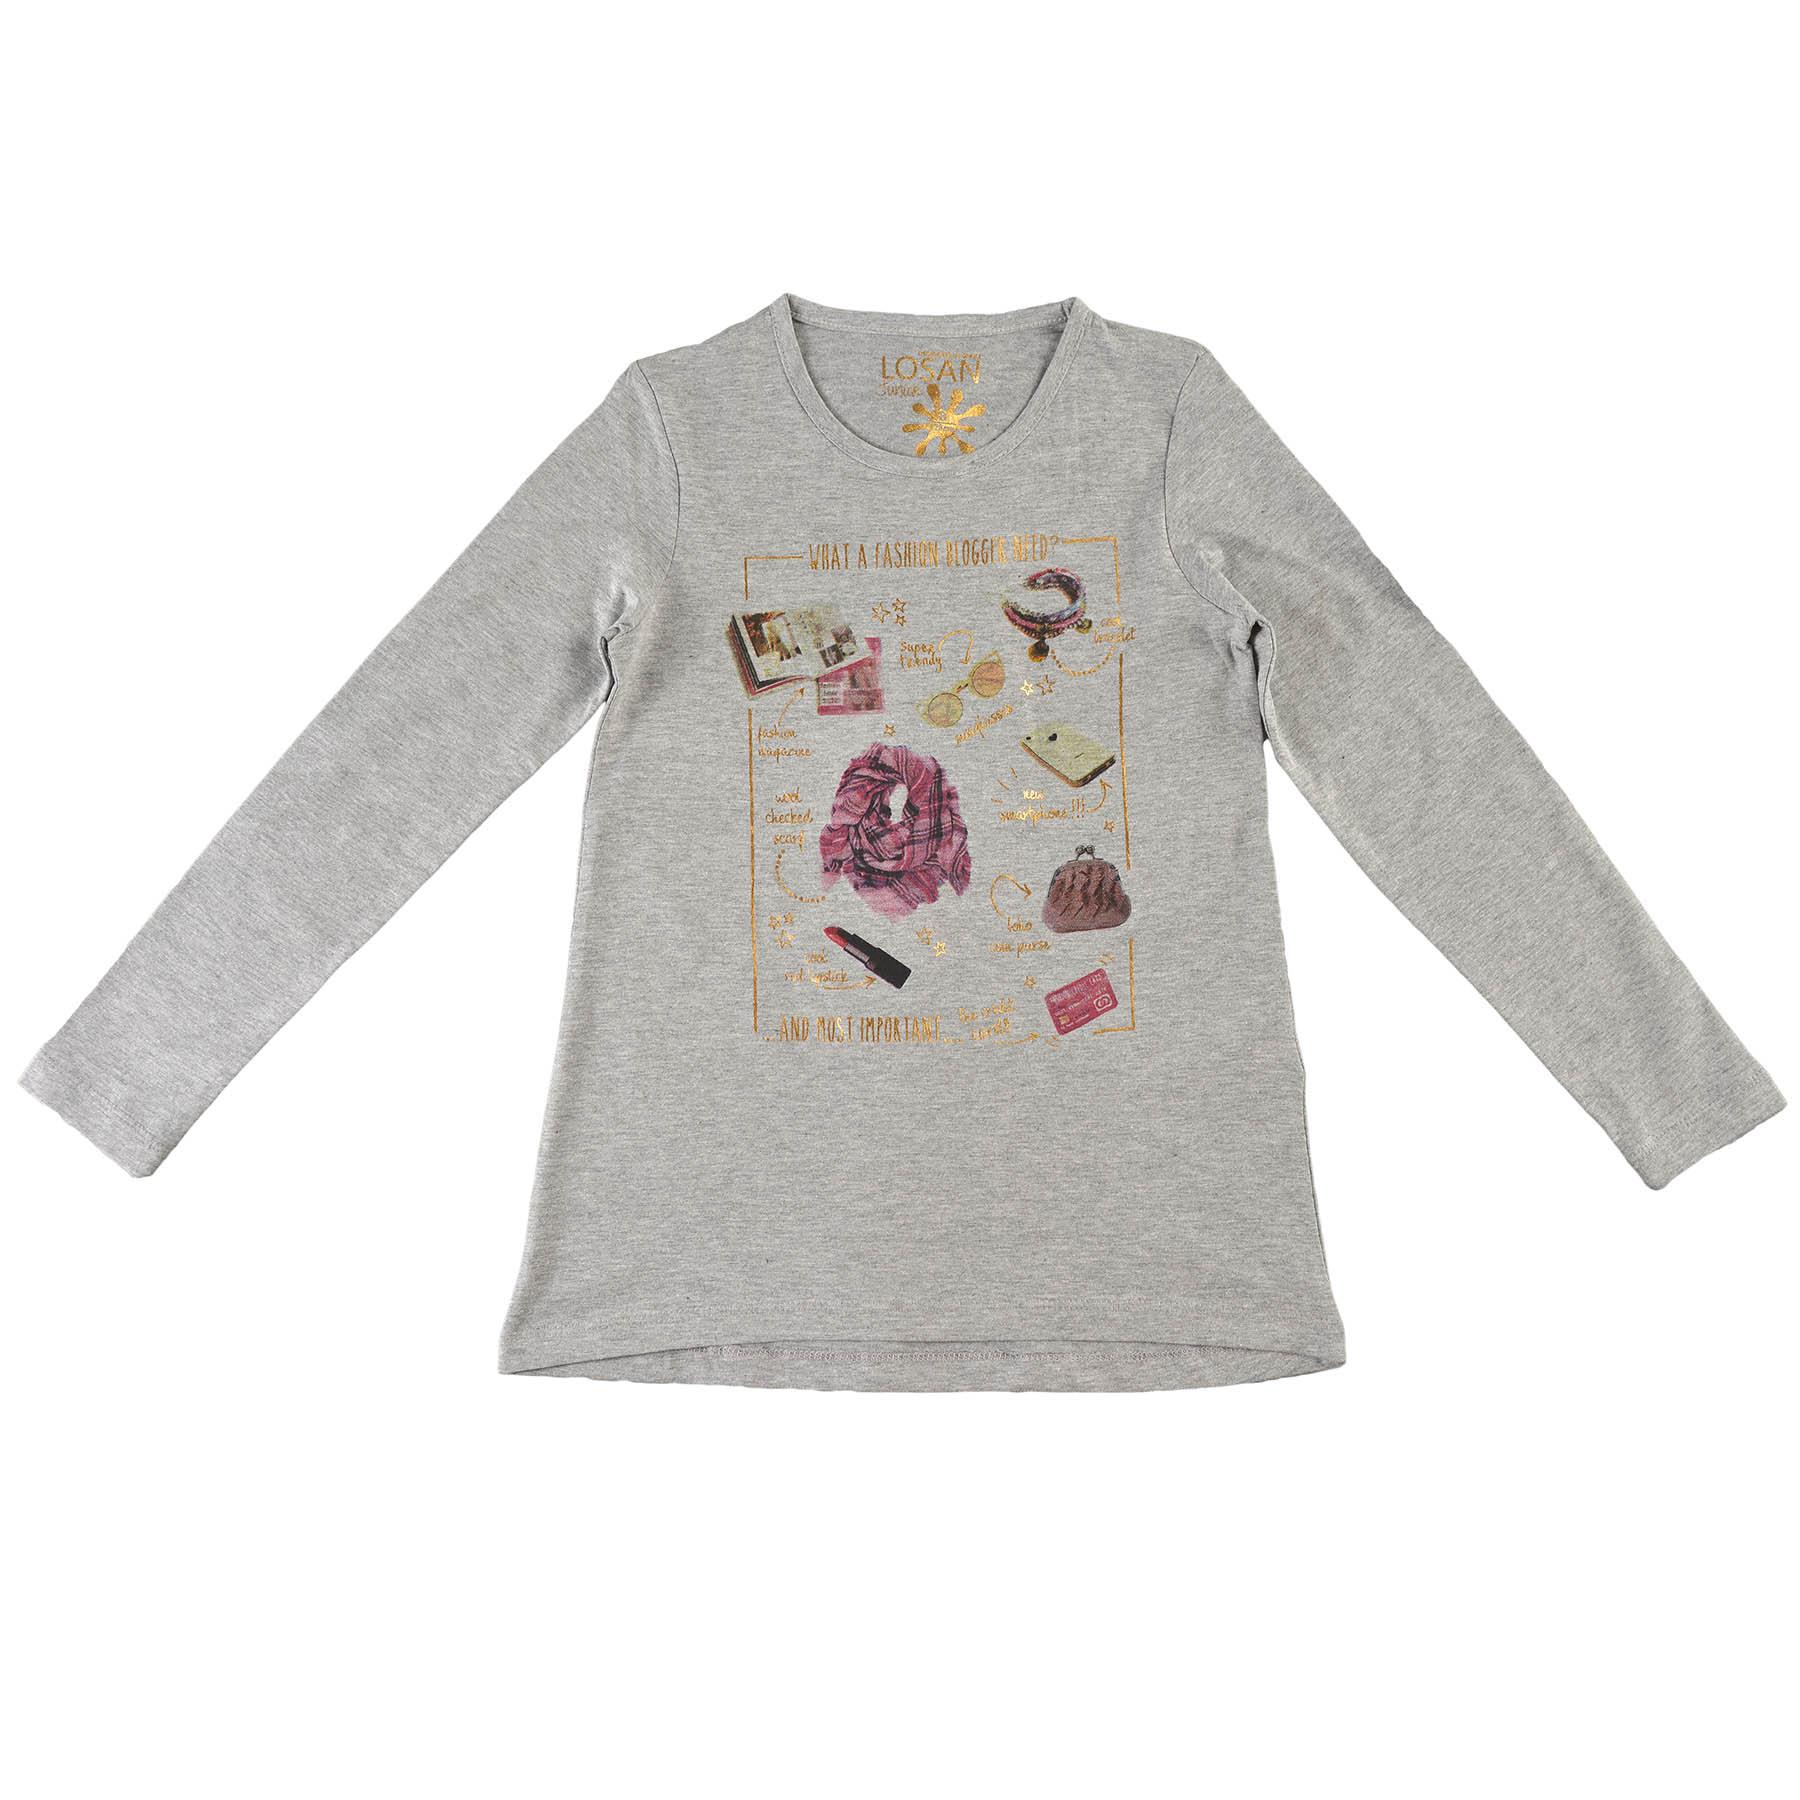 fdede51f47981 Dievčenské tričko Losan - 624-1202-300 | Lollipopkids.sk